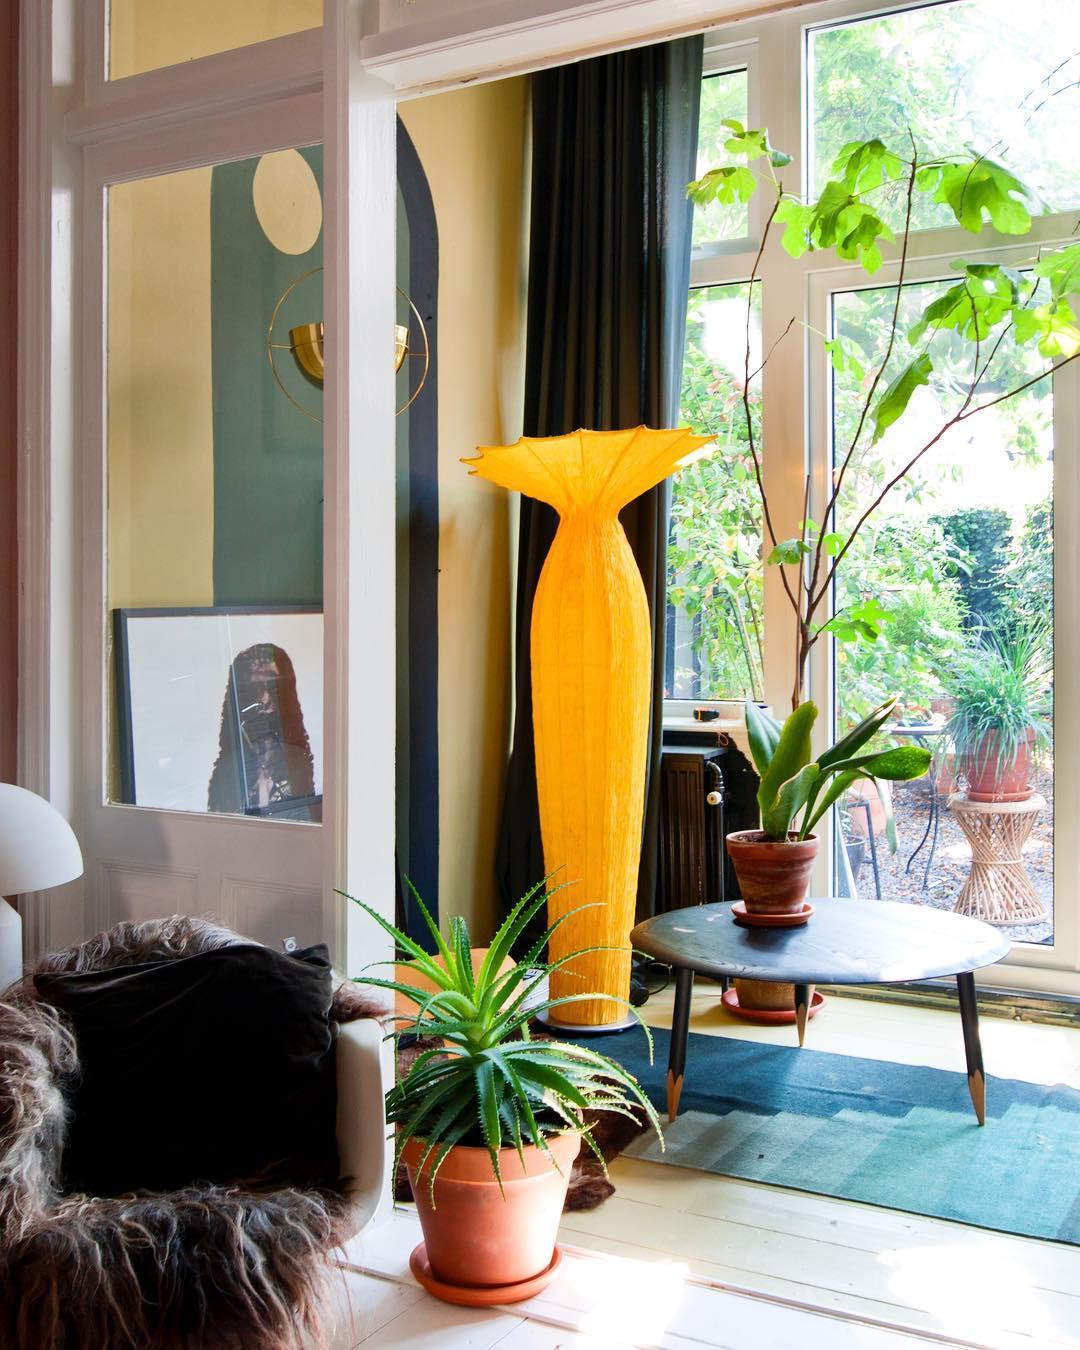 Théo-Bert Pot comment aménager une véranda espace arty retro jungle